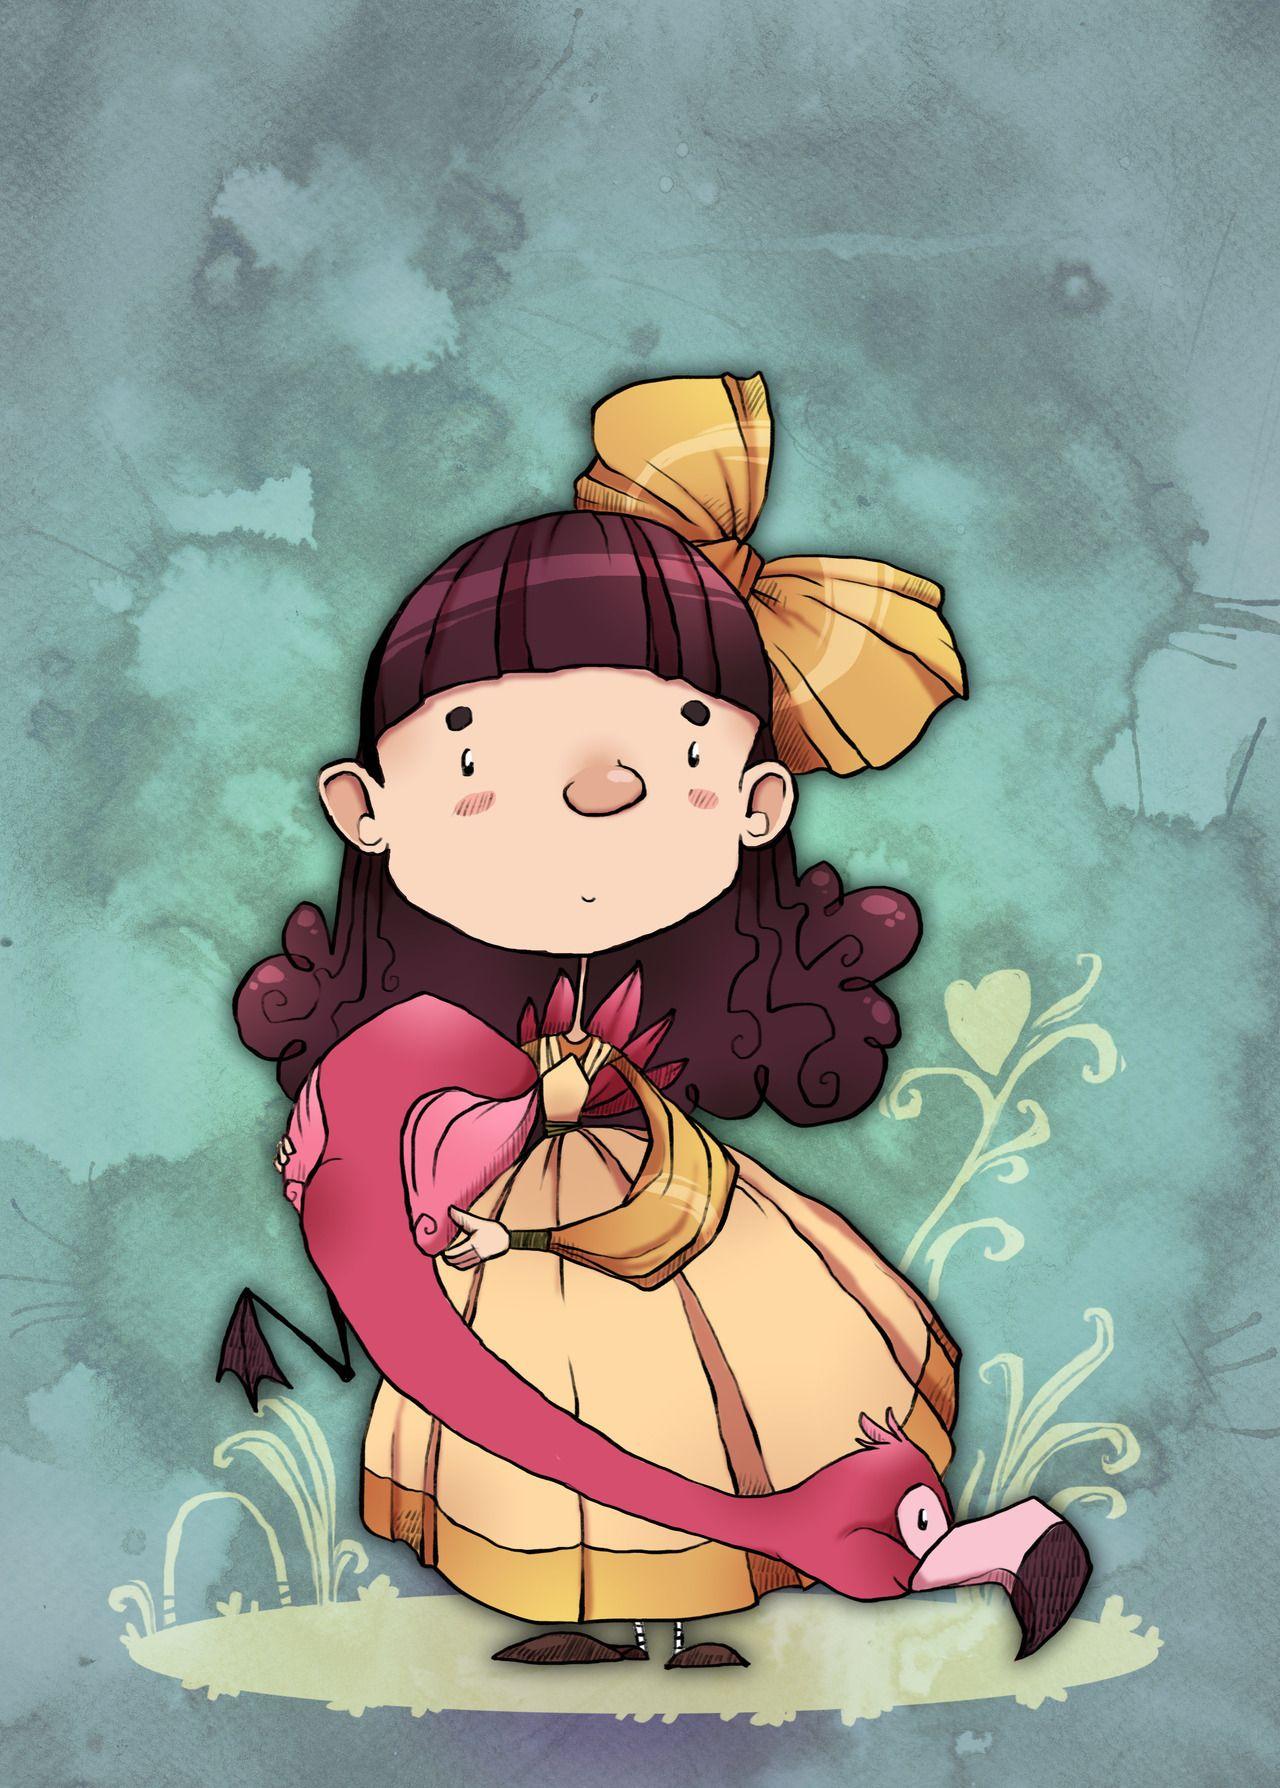 ZestyDoesThings Alice in wonderland theme, Spoopy, Pink cow